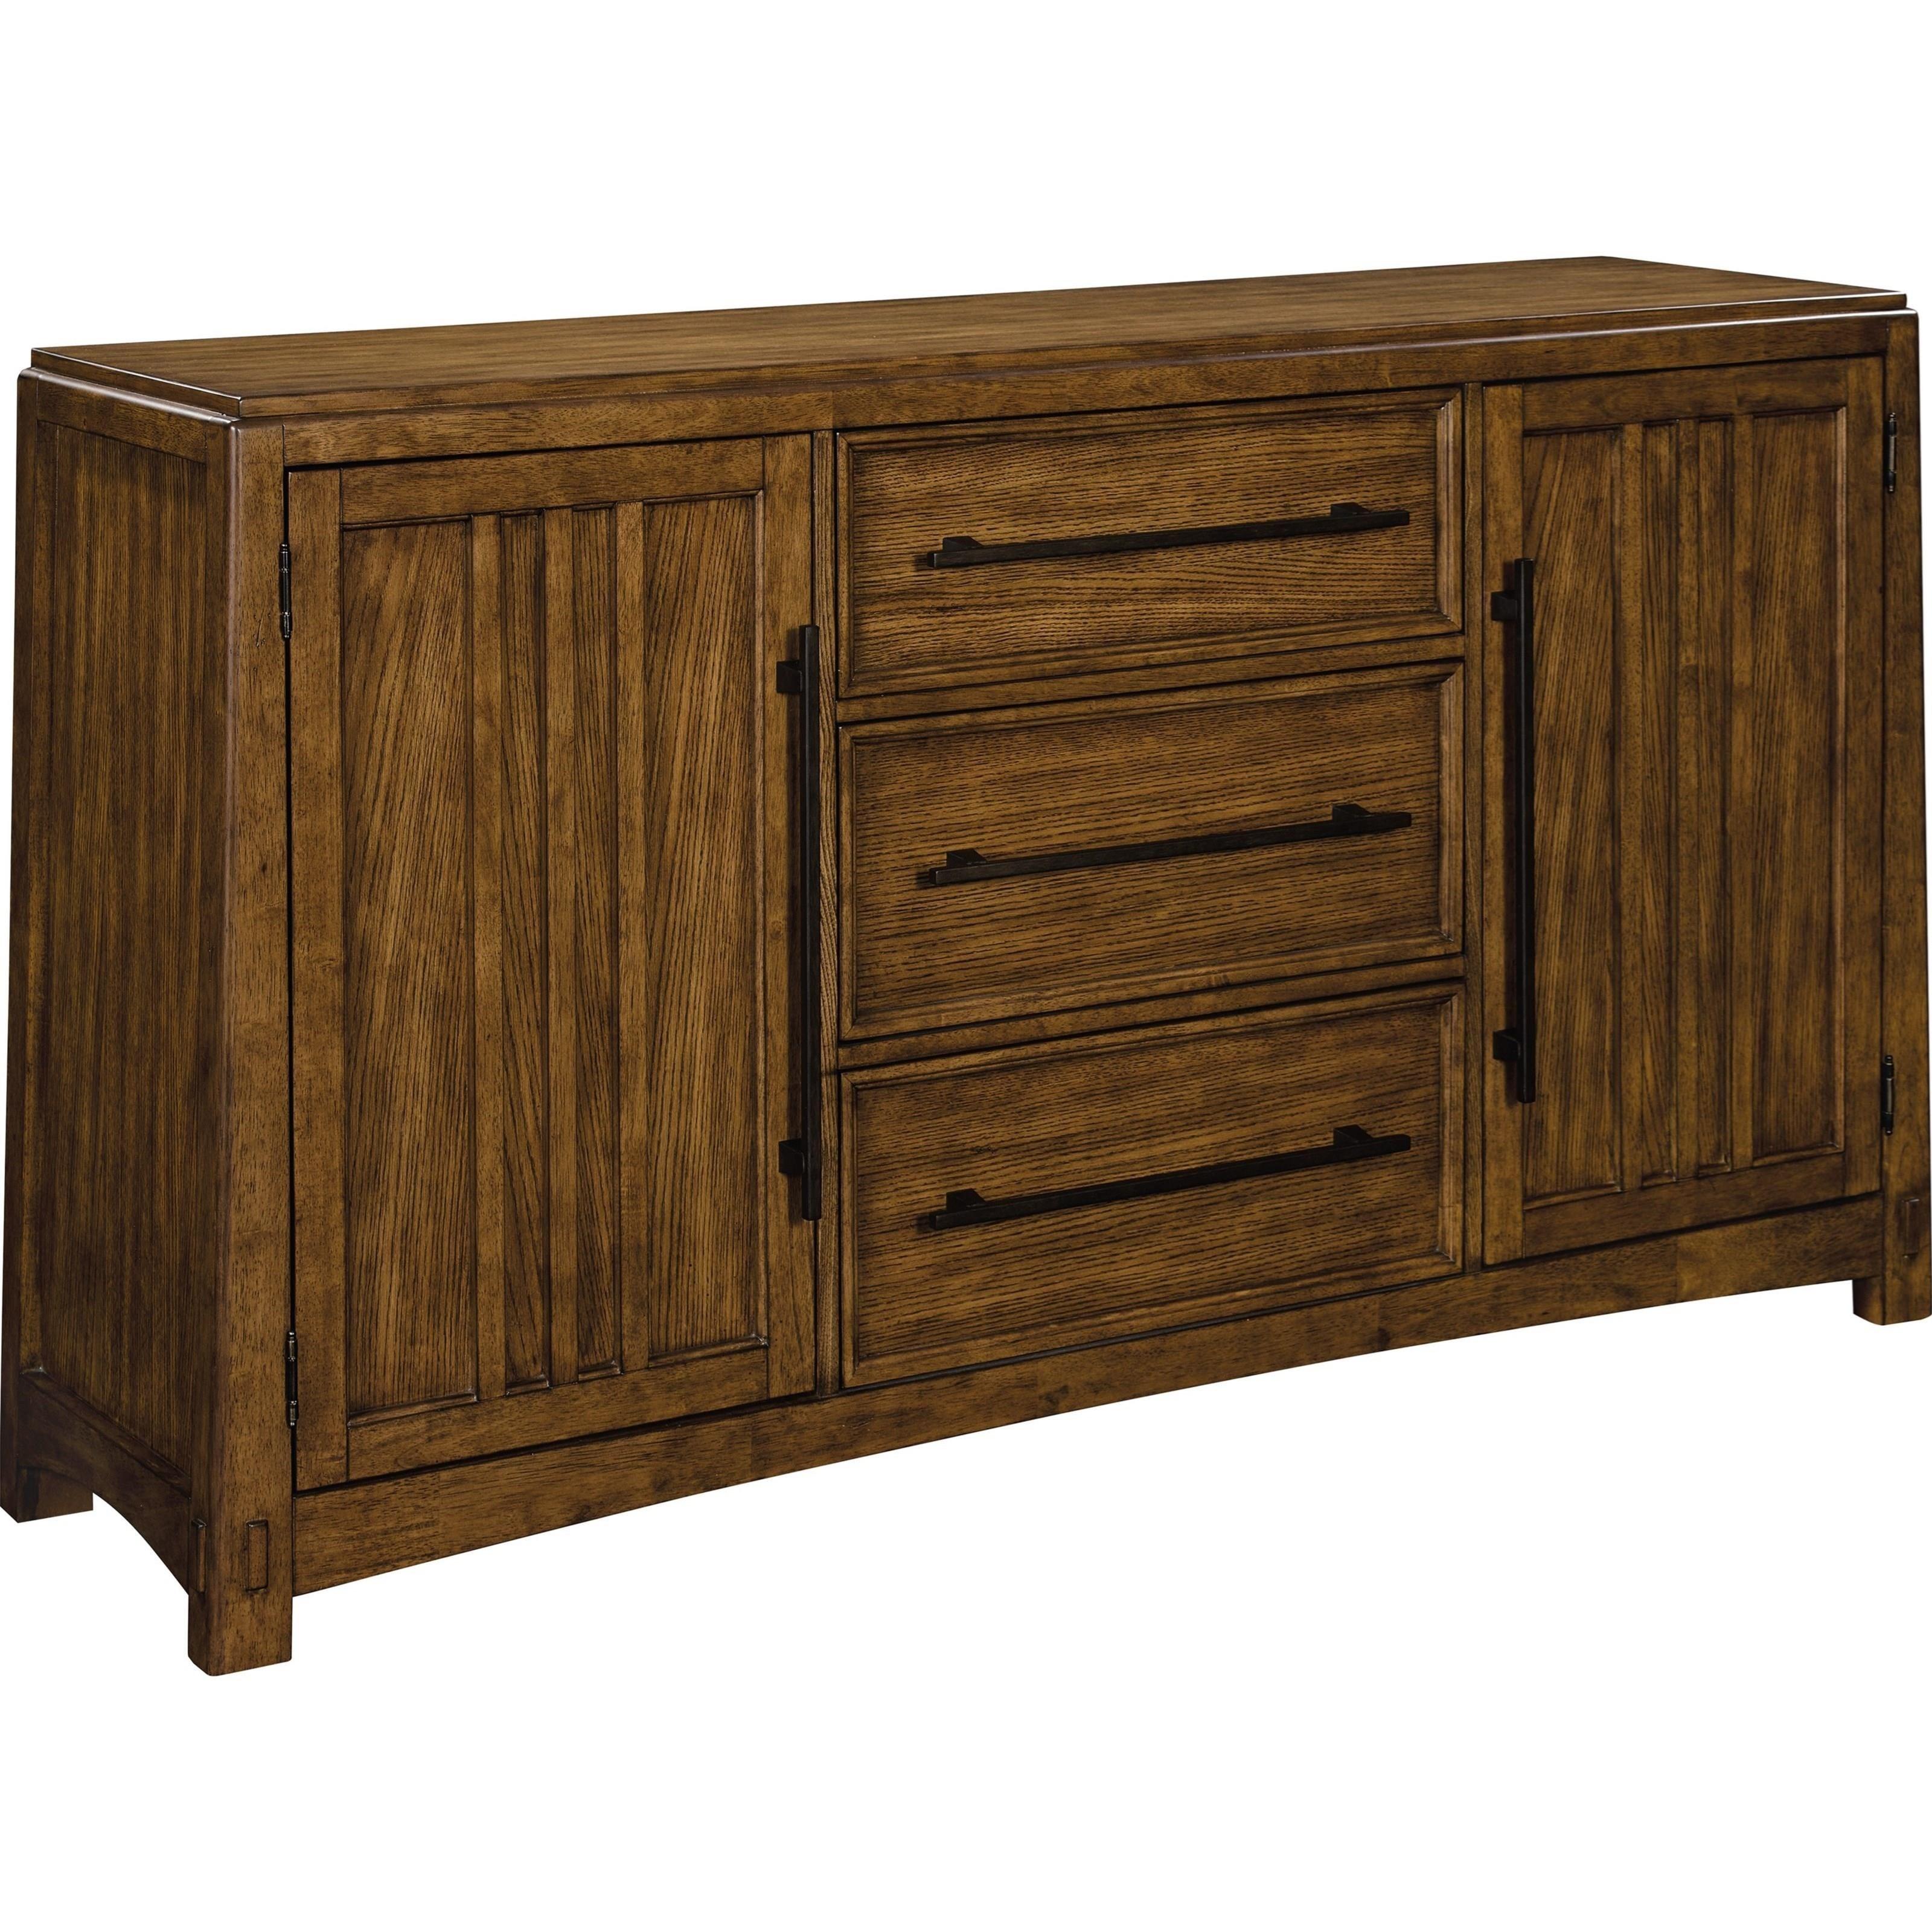 Broyhill Furniture Winslow Park Buffet   Item Number: 4604 513